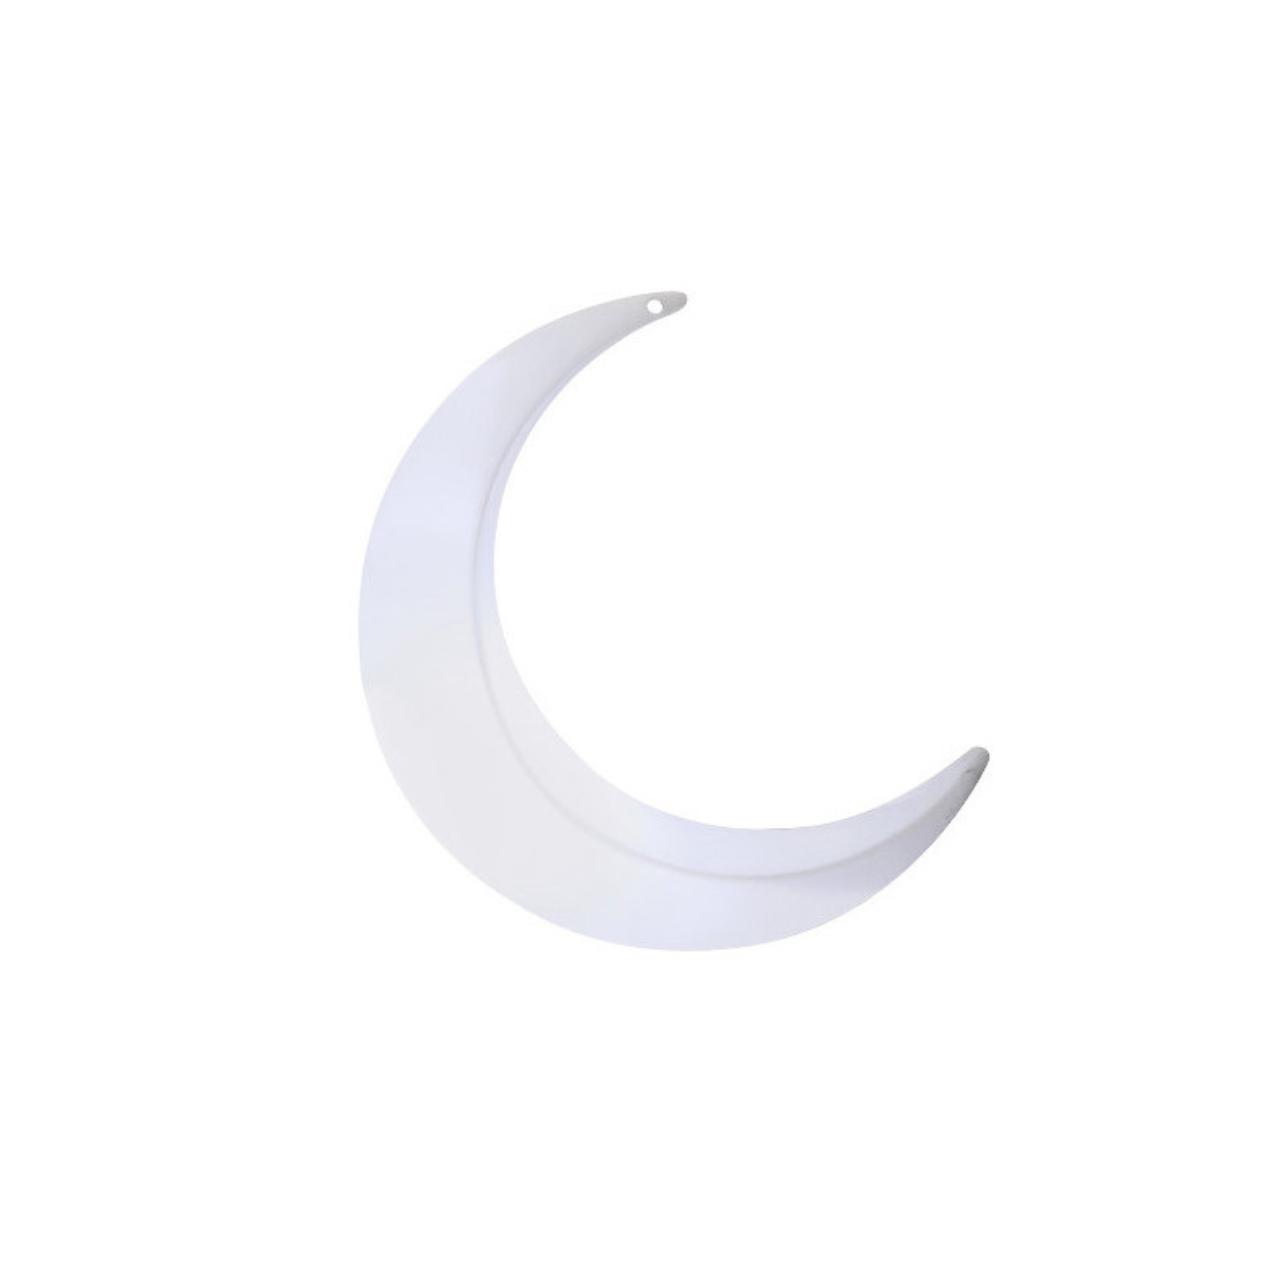 Large Lighting LED Crescent Moon Swing